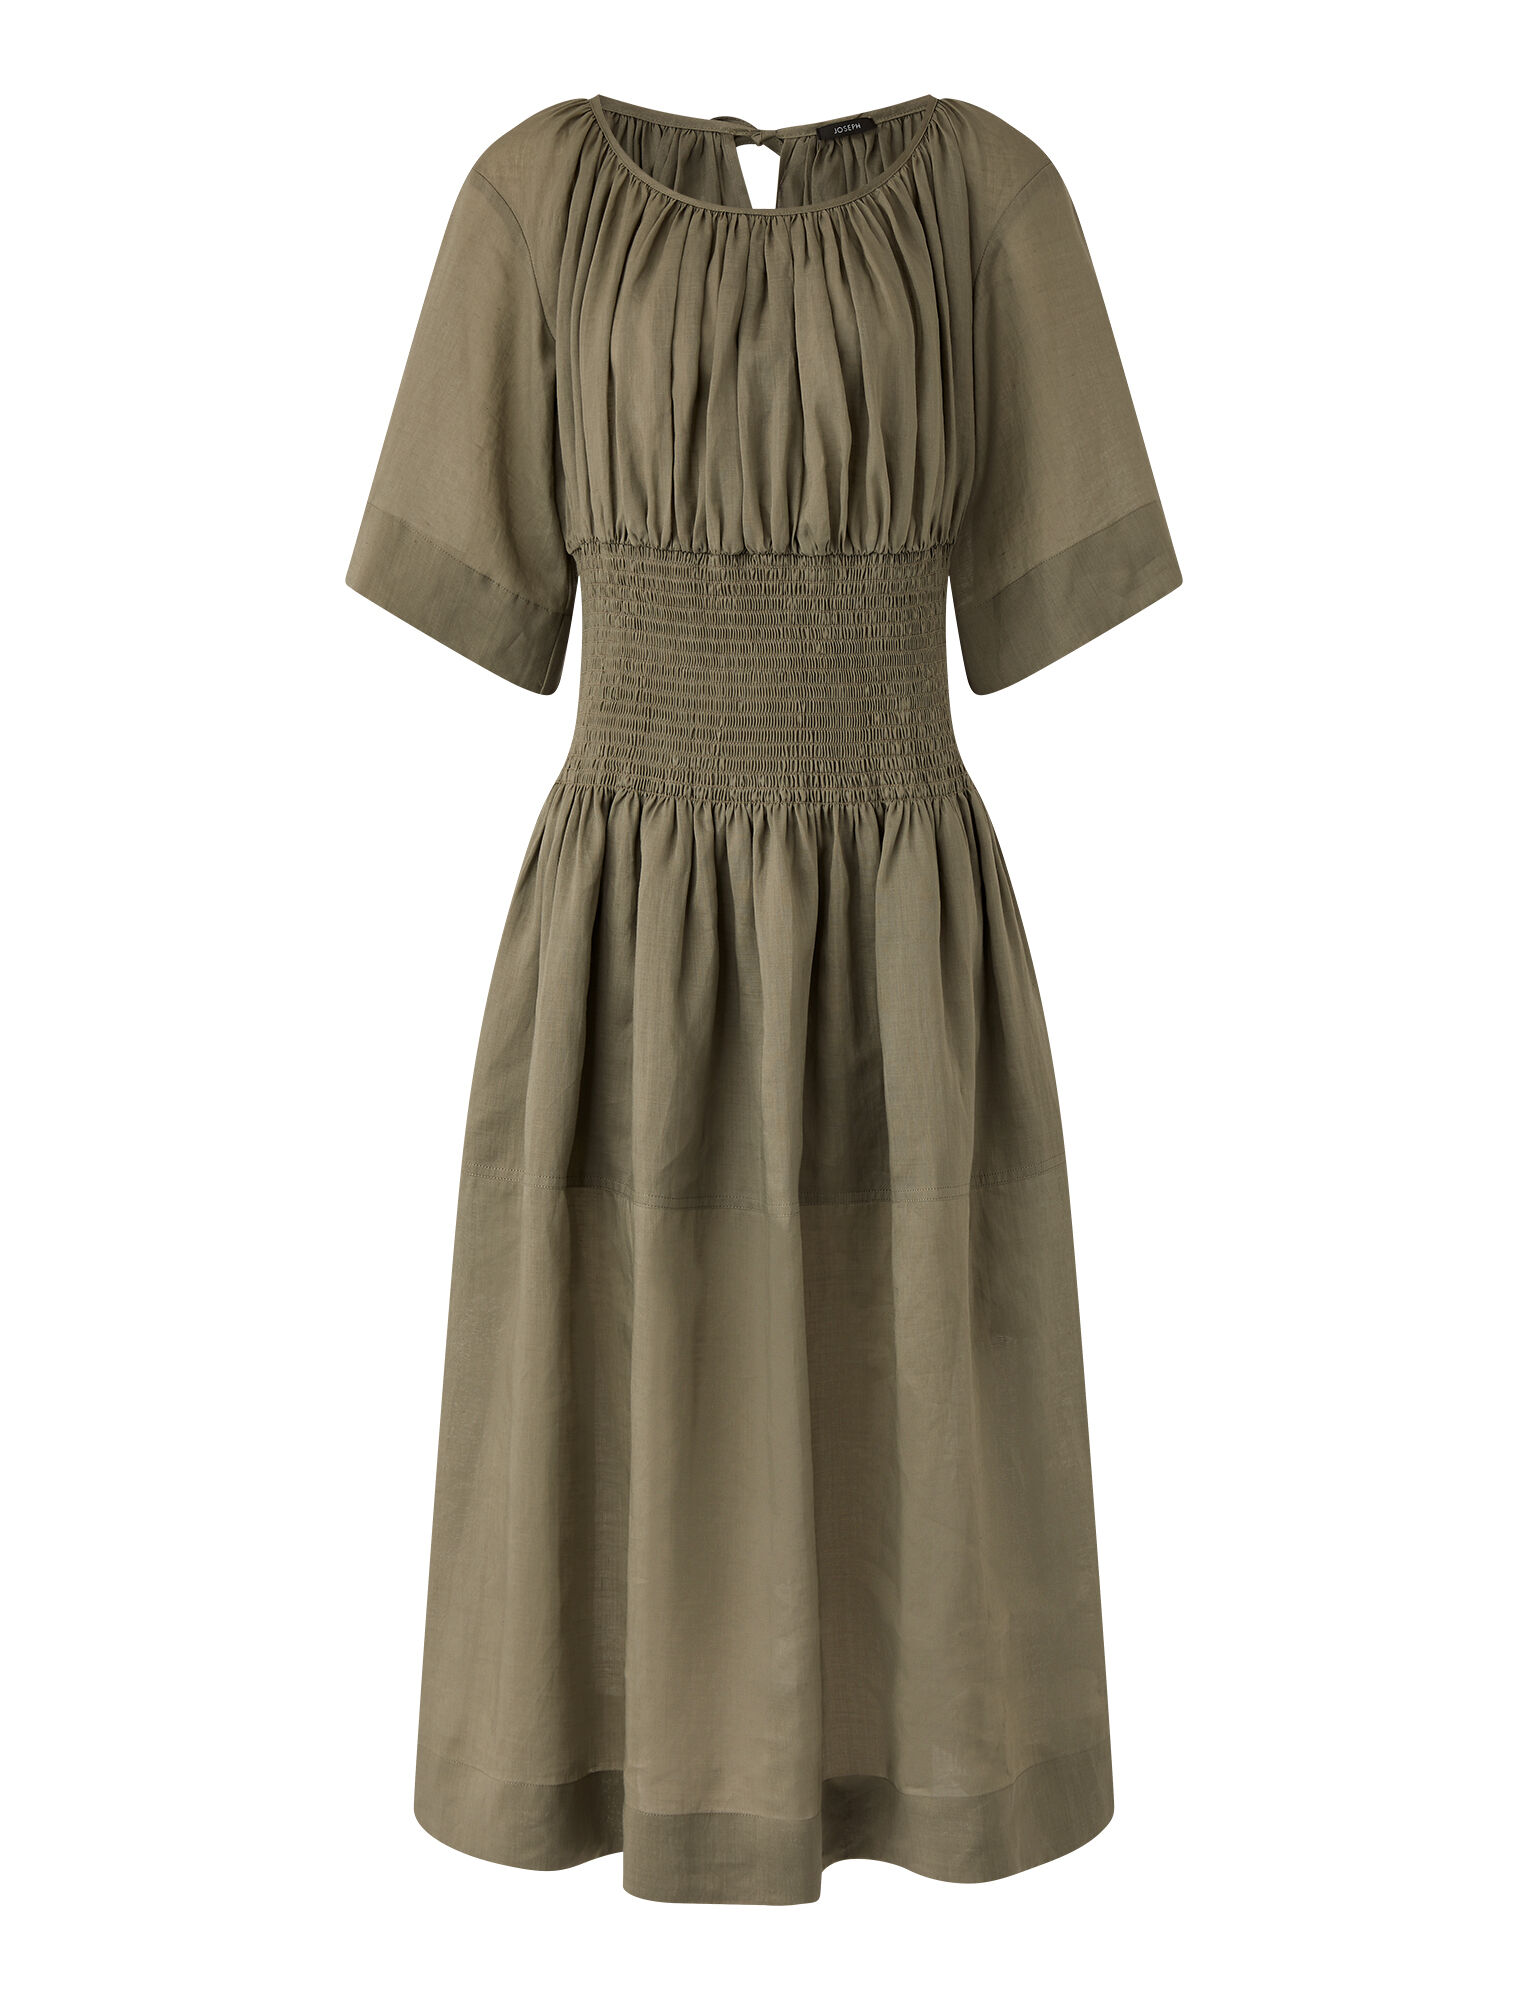 Joseph, Ramie Voile Daison Dress, in ARGIL